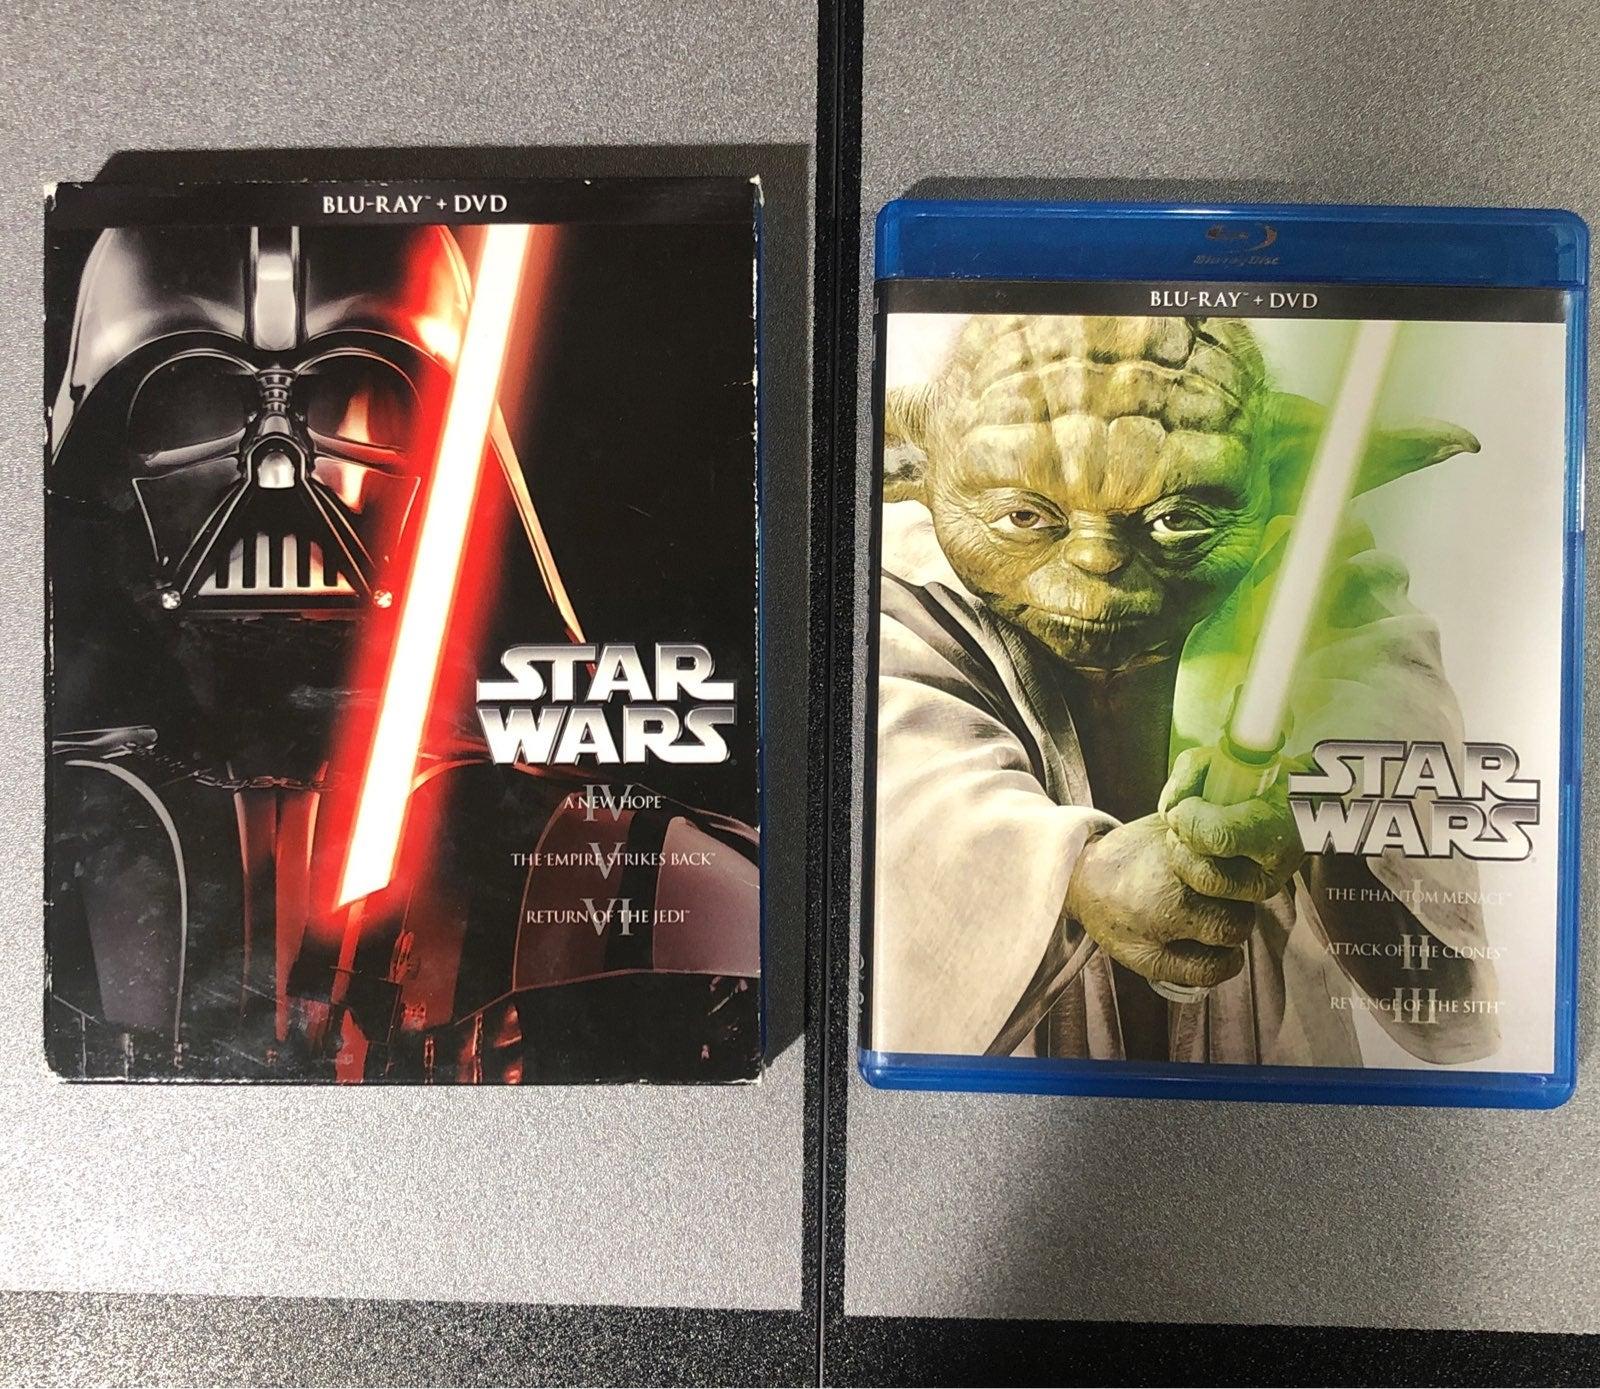 Star Wars DVD Sets